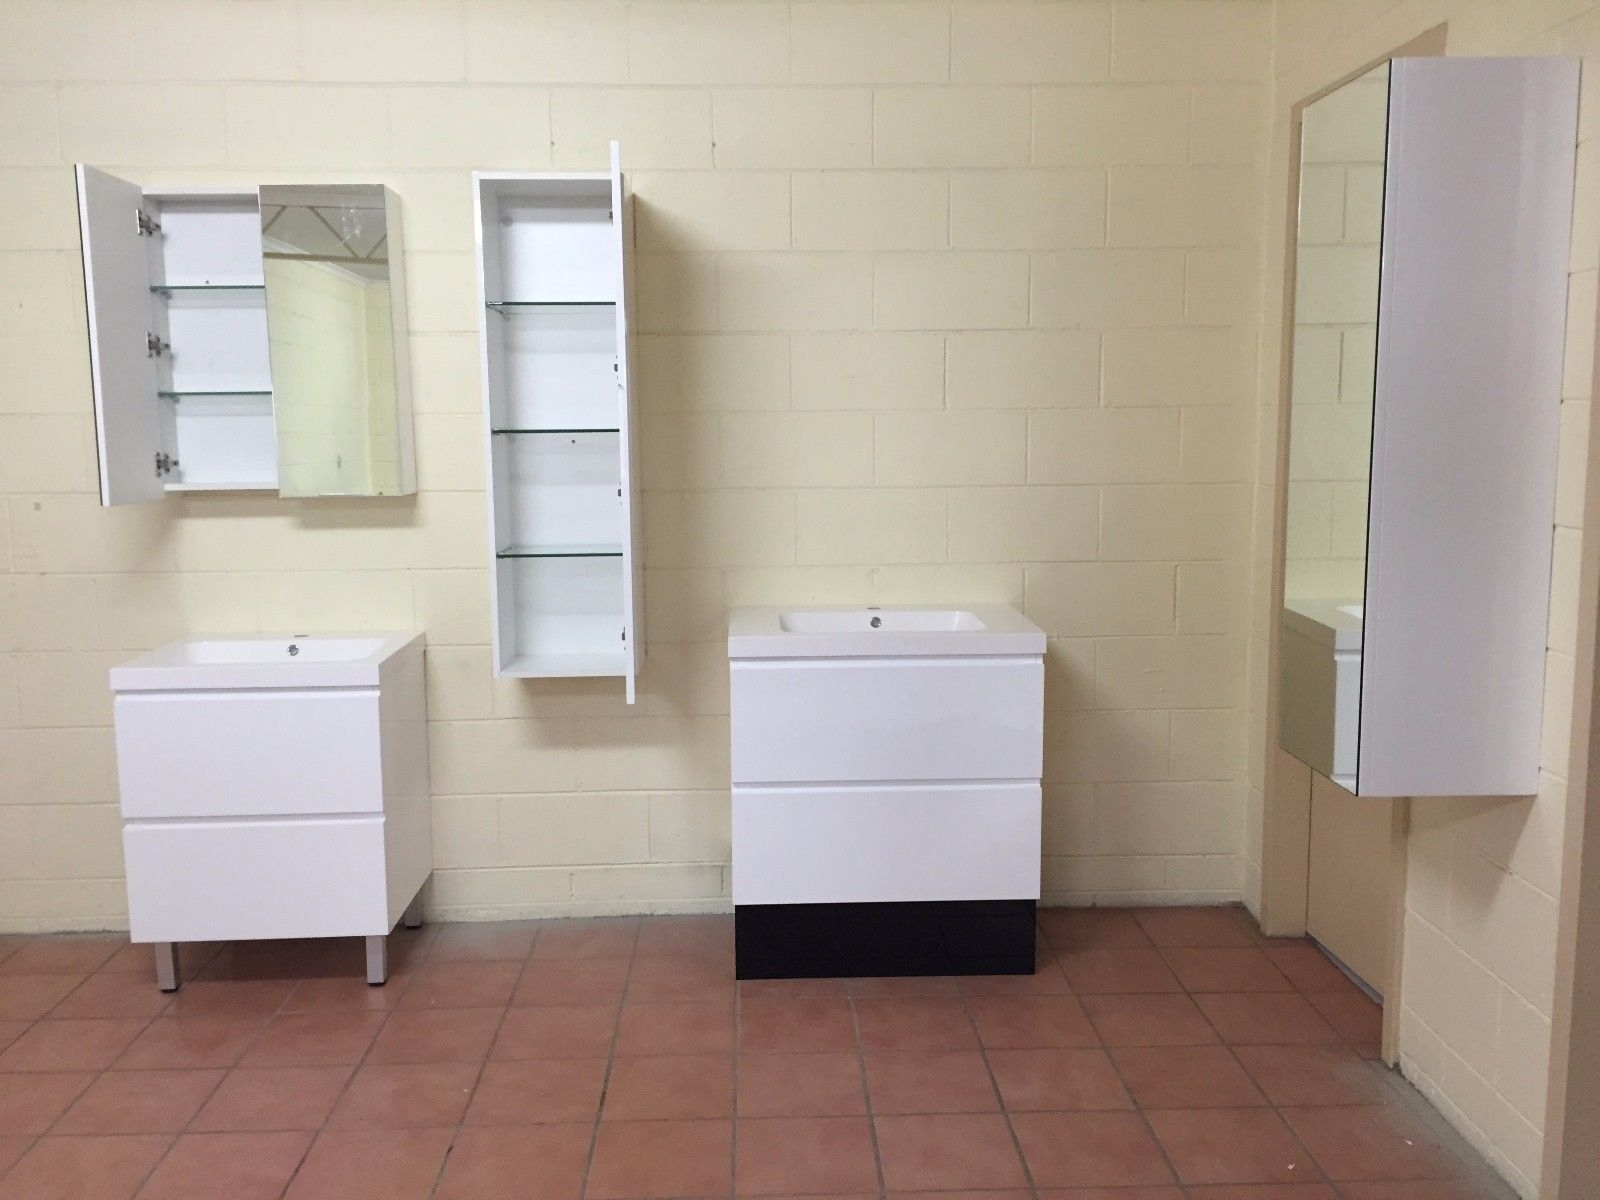 1200mm white gloss polyurethane wall hung mirror bathroom - Bathroom storage wall cabinets white ...